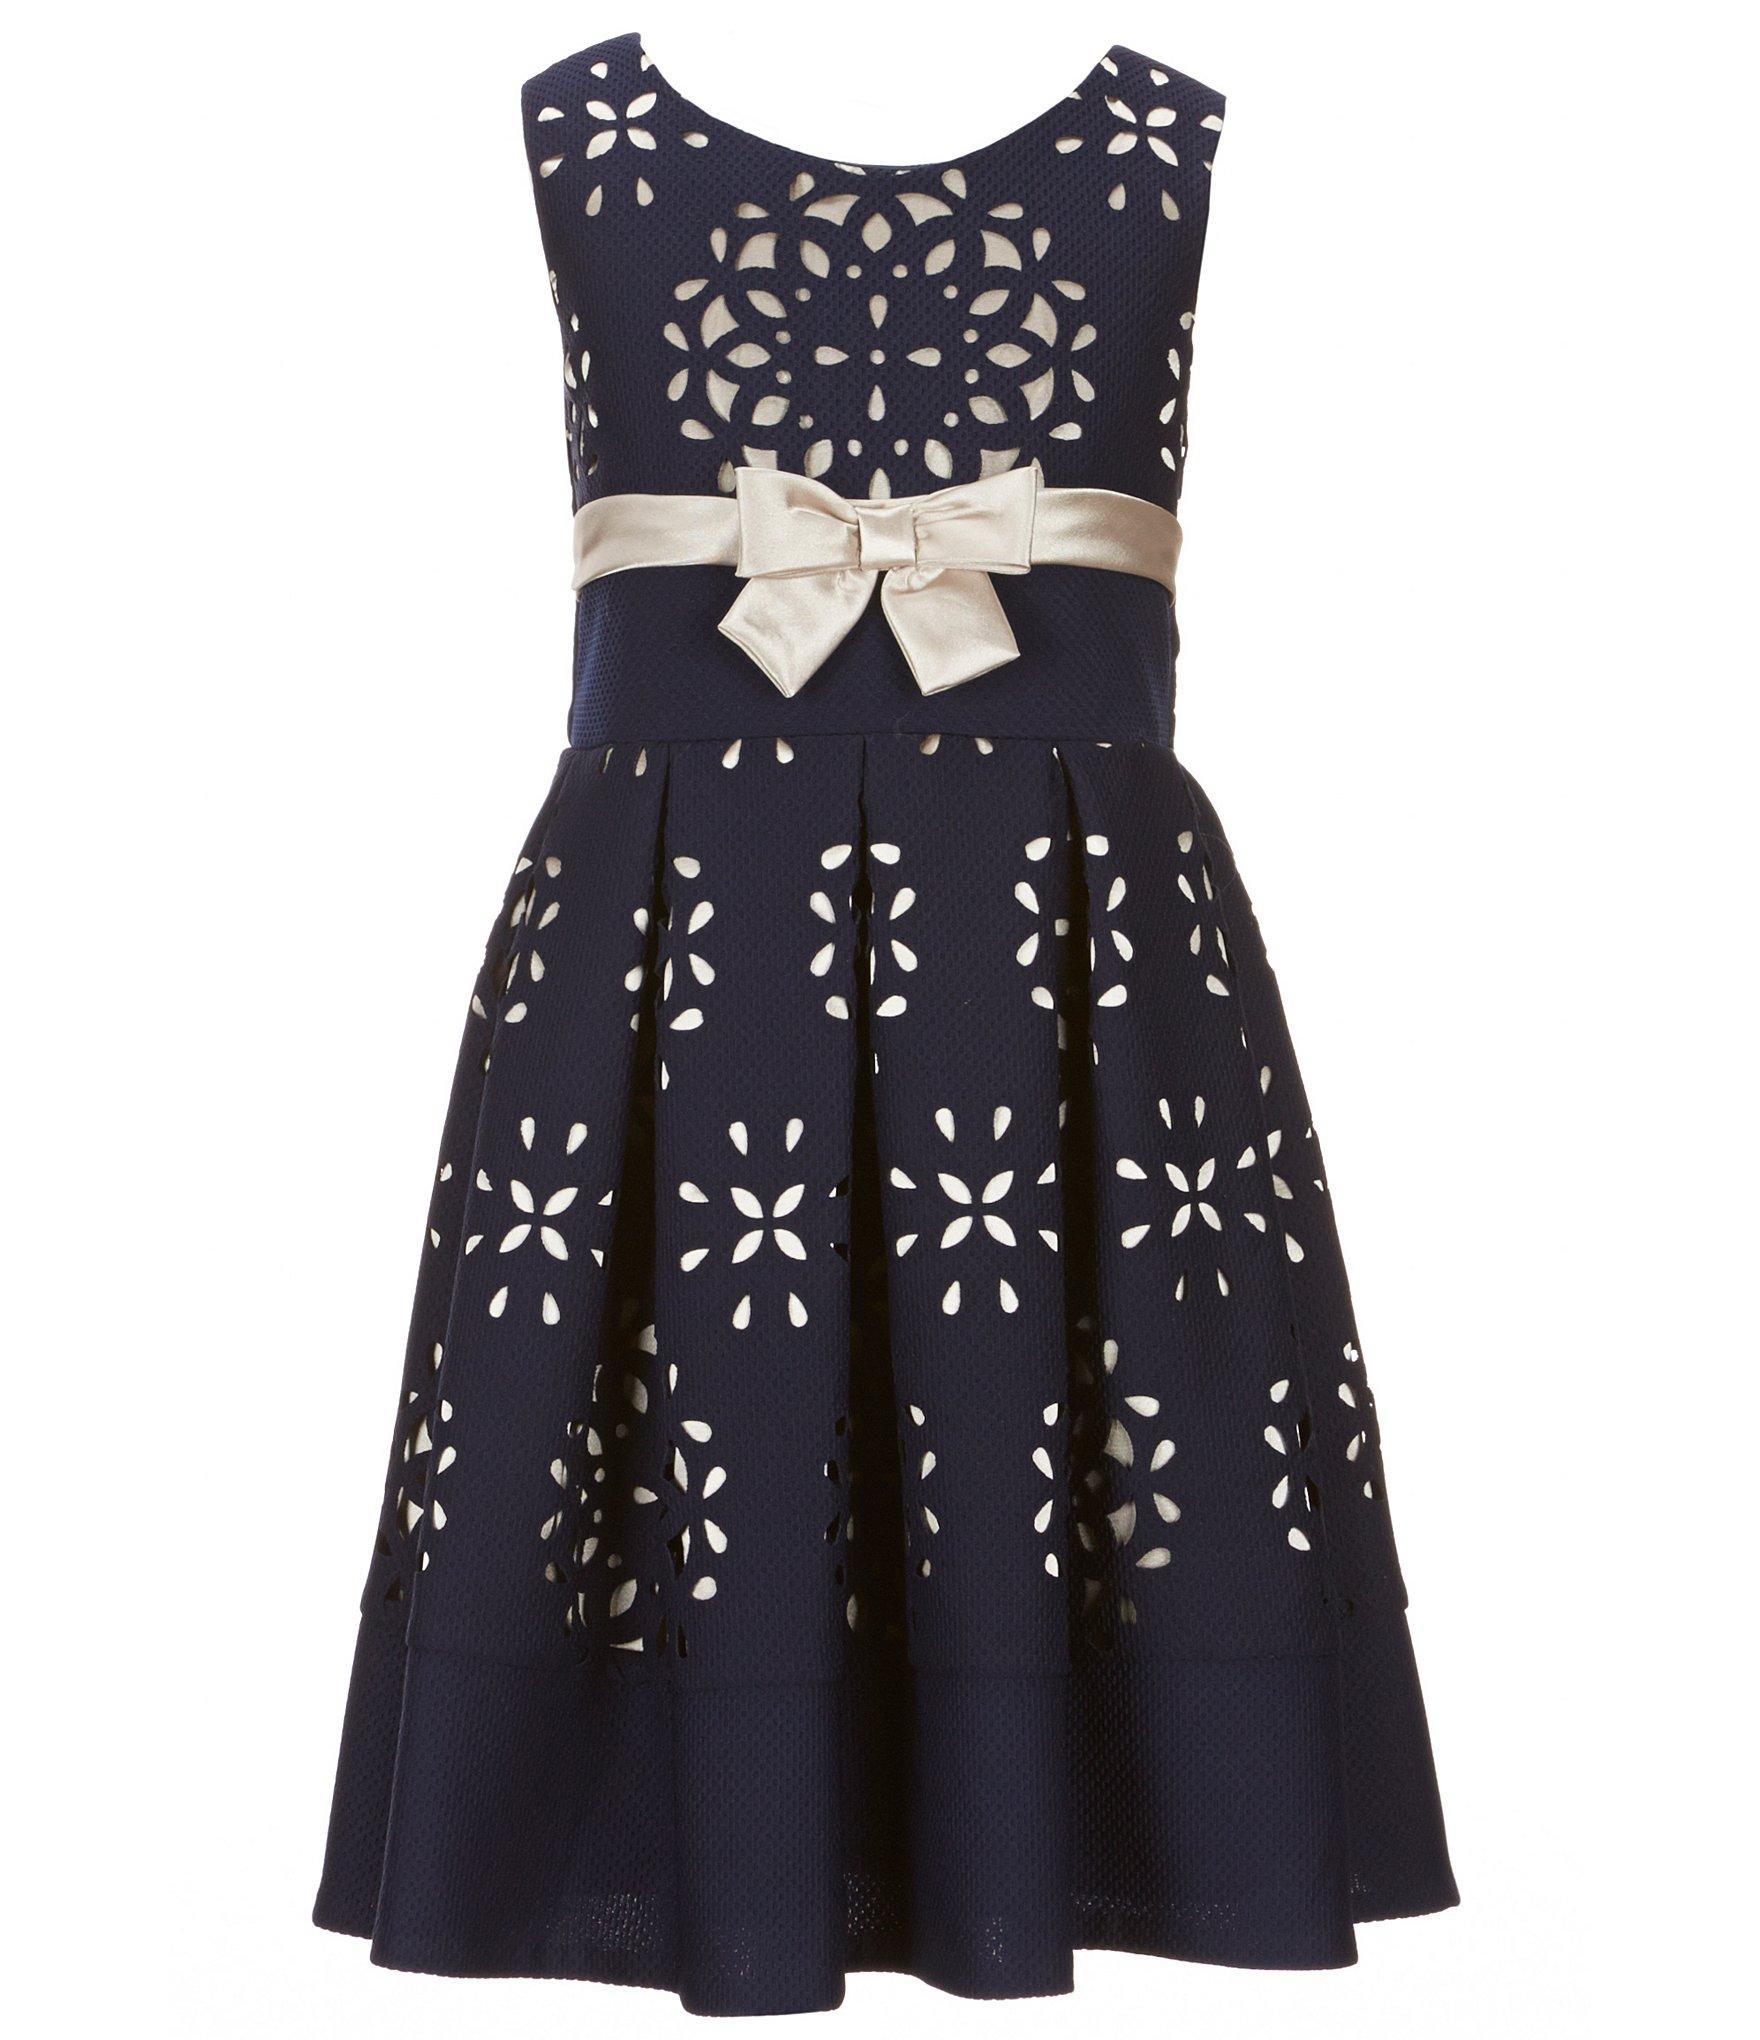 Black dress for baby girl - Black Dress For Baby Girl 31